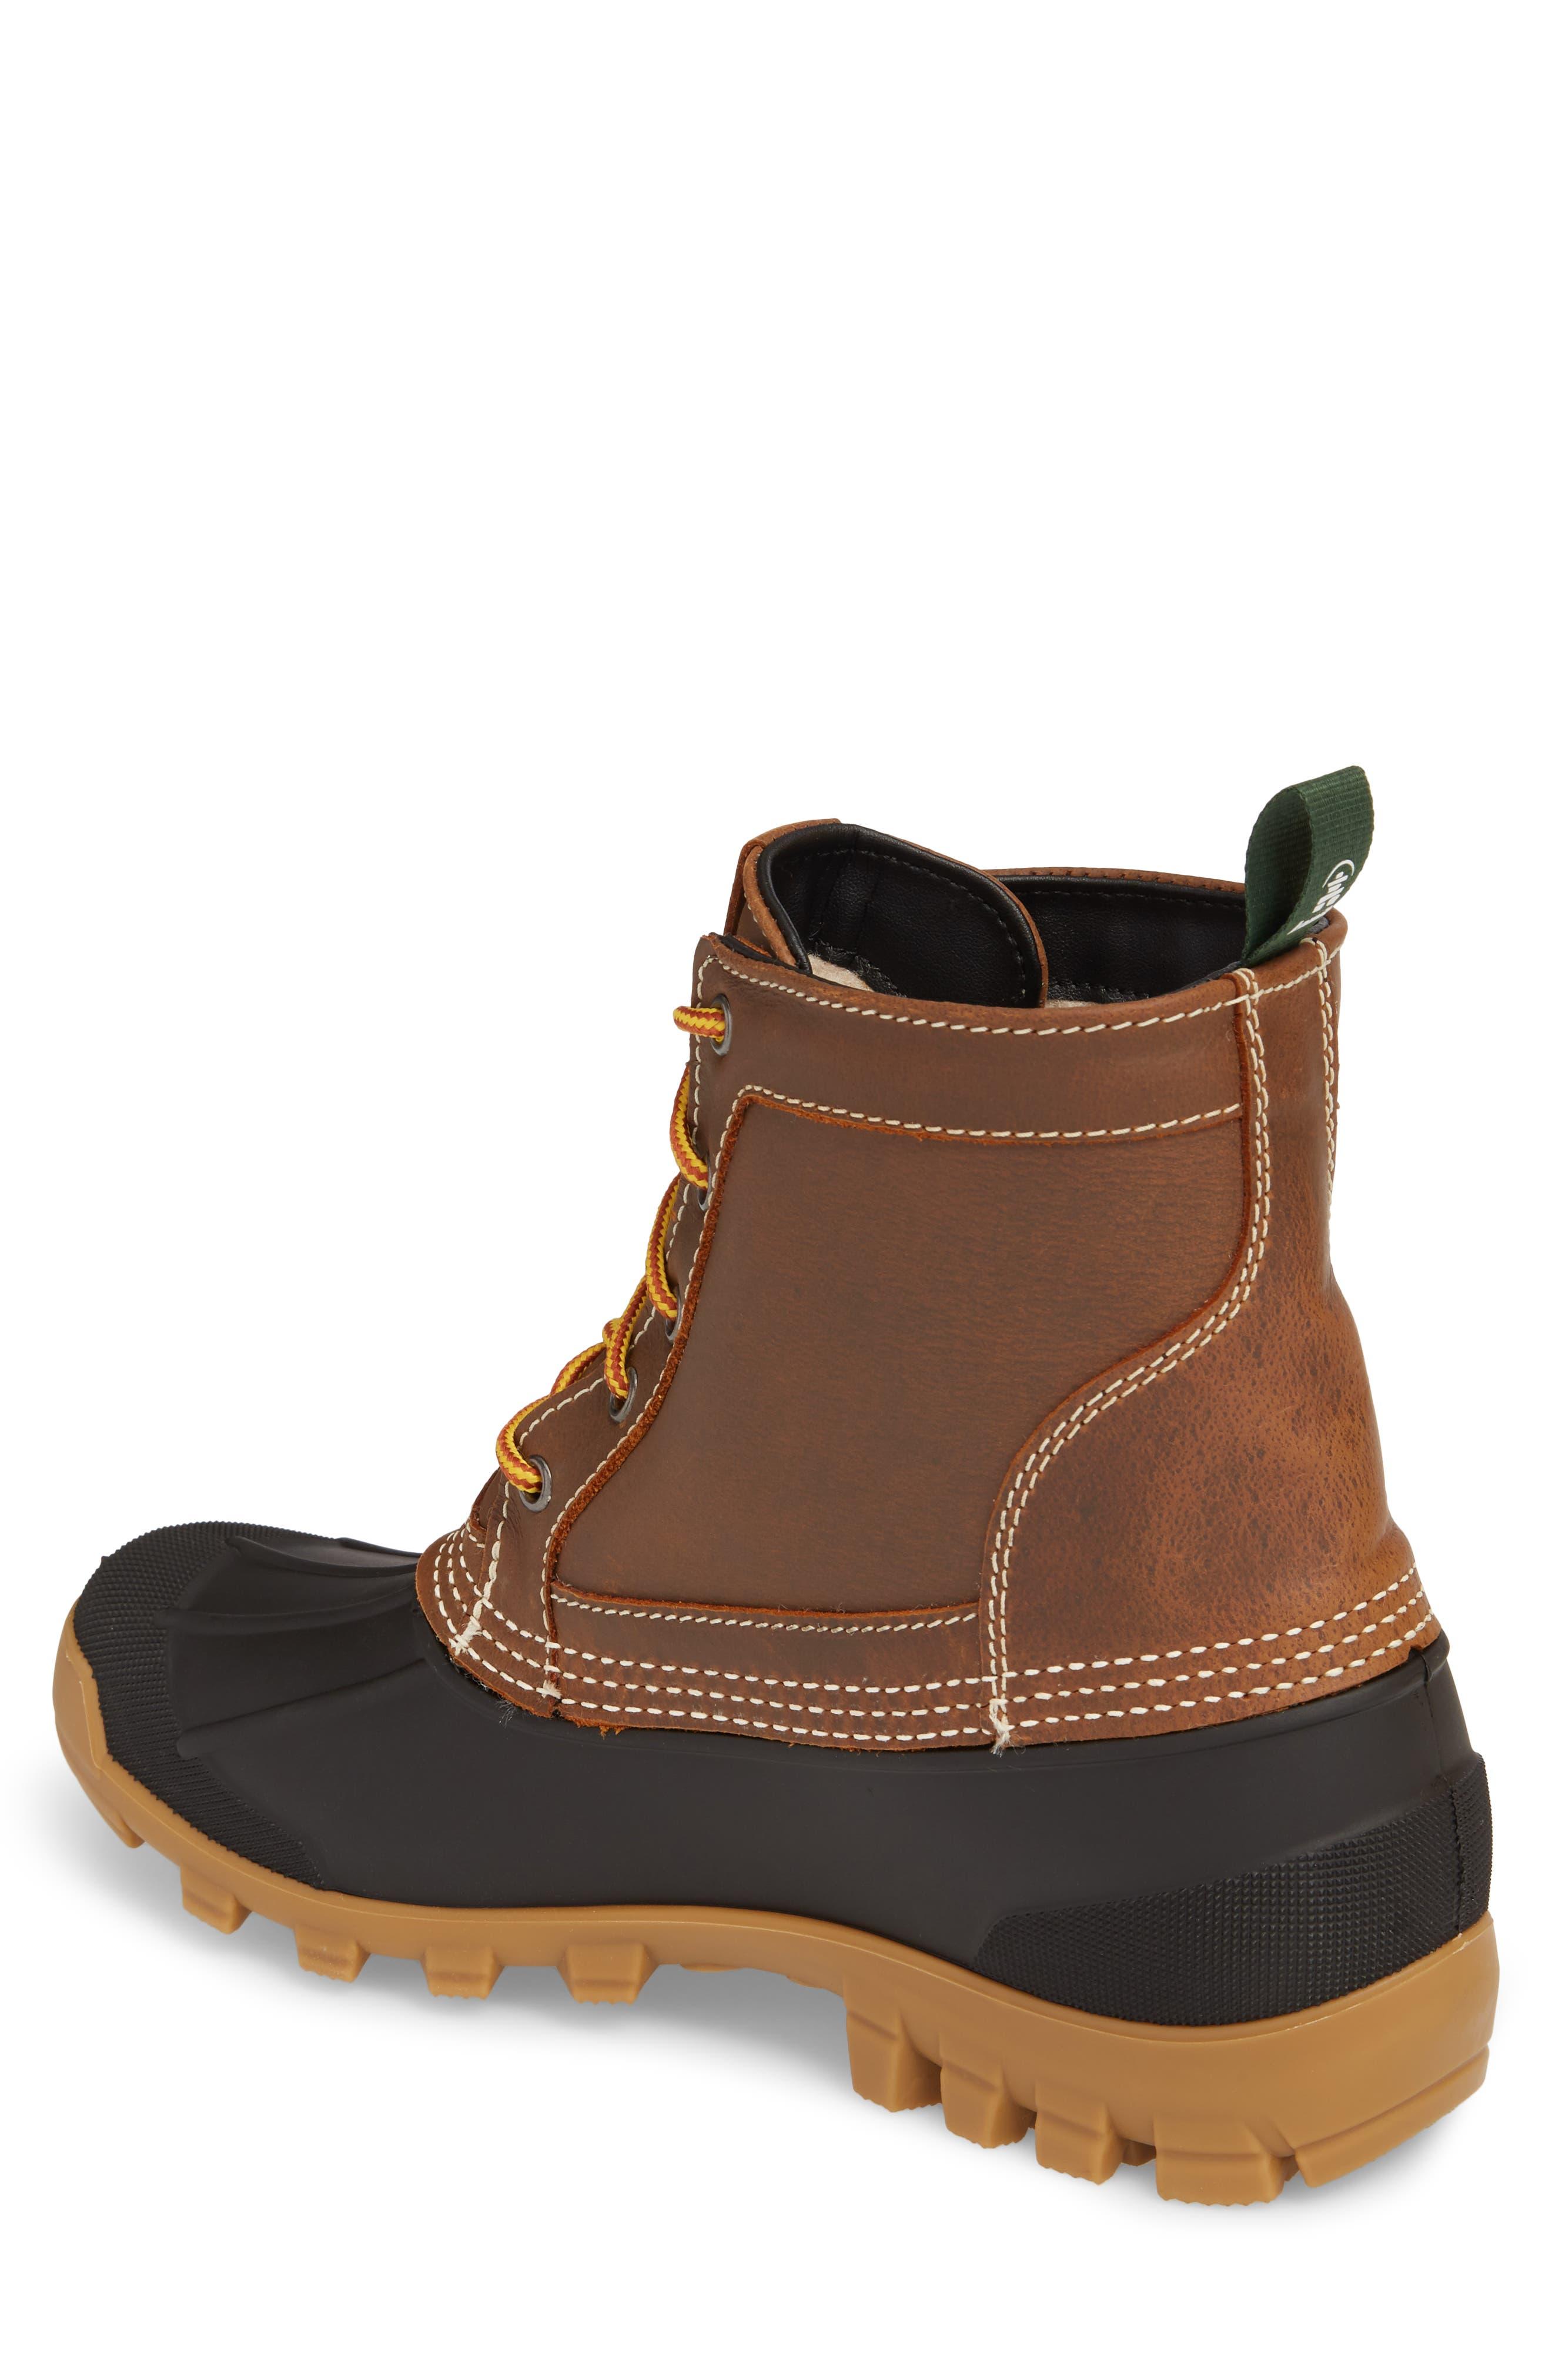 Yukon 5 Waterproof Insulated Three-Season Boot,                             Alternate thumbnail 2, color,                             201